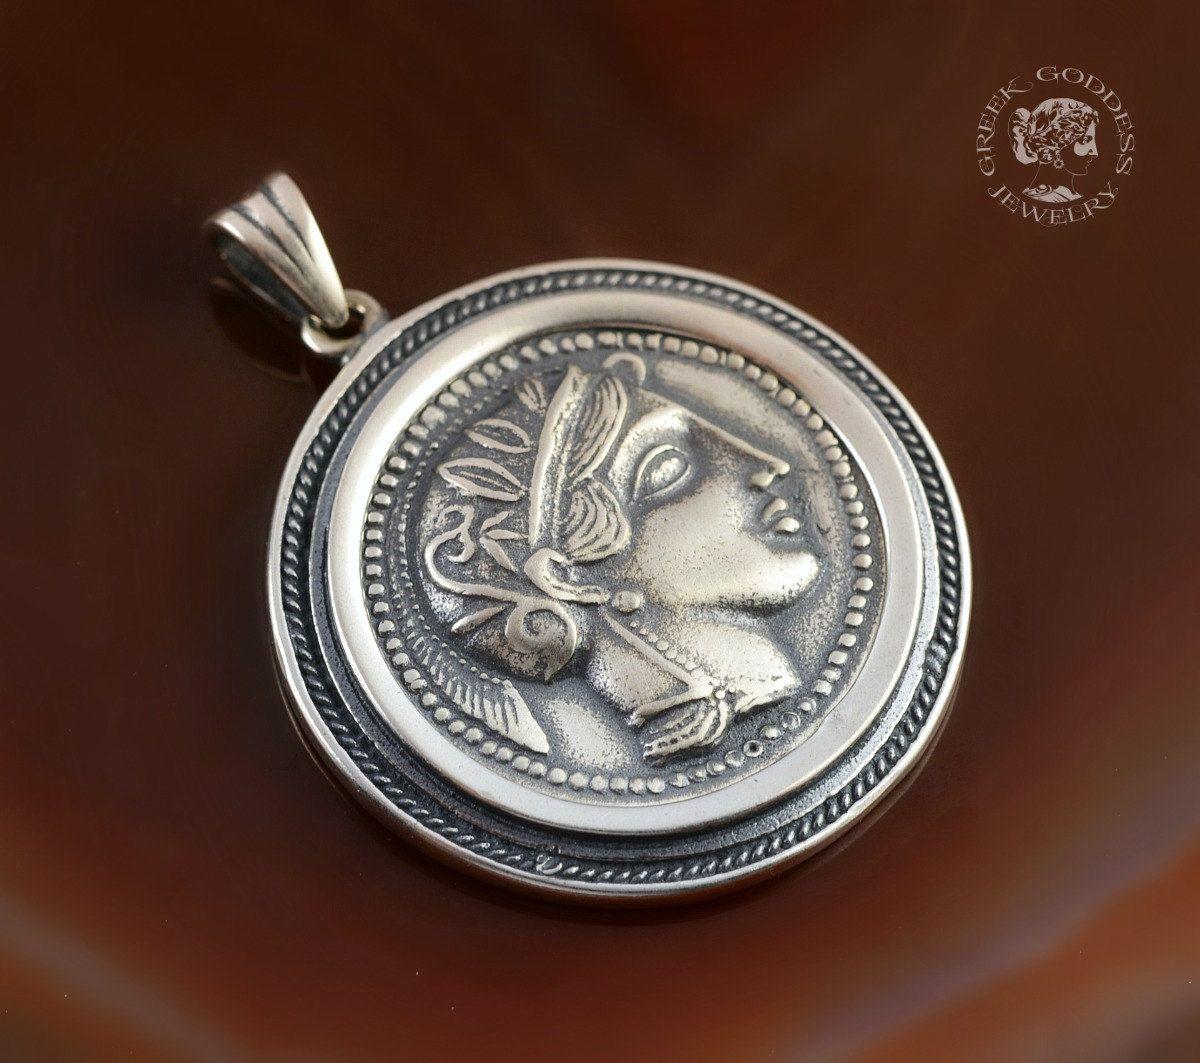 Athena silver pendant athena pendant ancient coin pendant coin athena silver pendant athena pendant ancient coin pendant coin pendant greek coin mozeypictures Choice Image